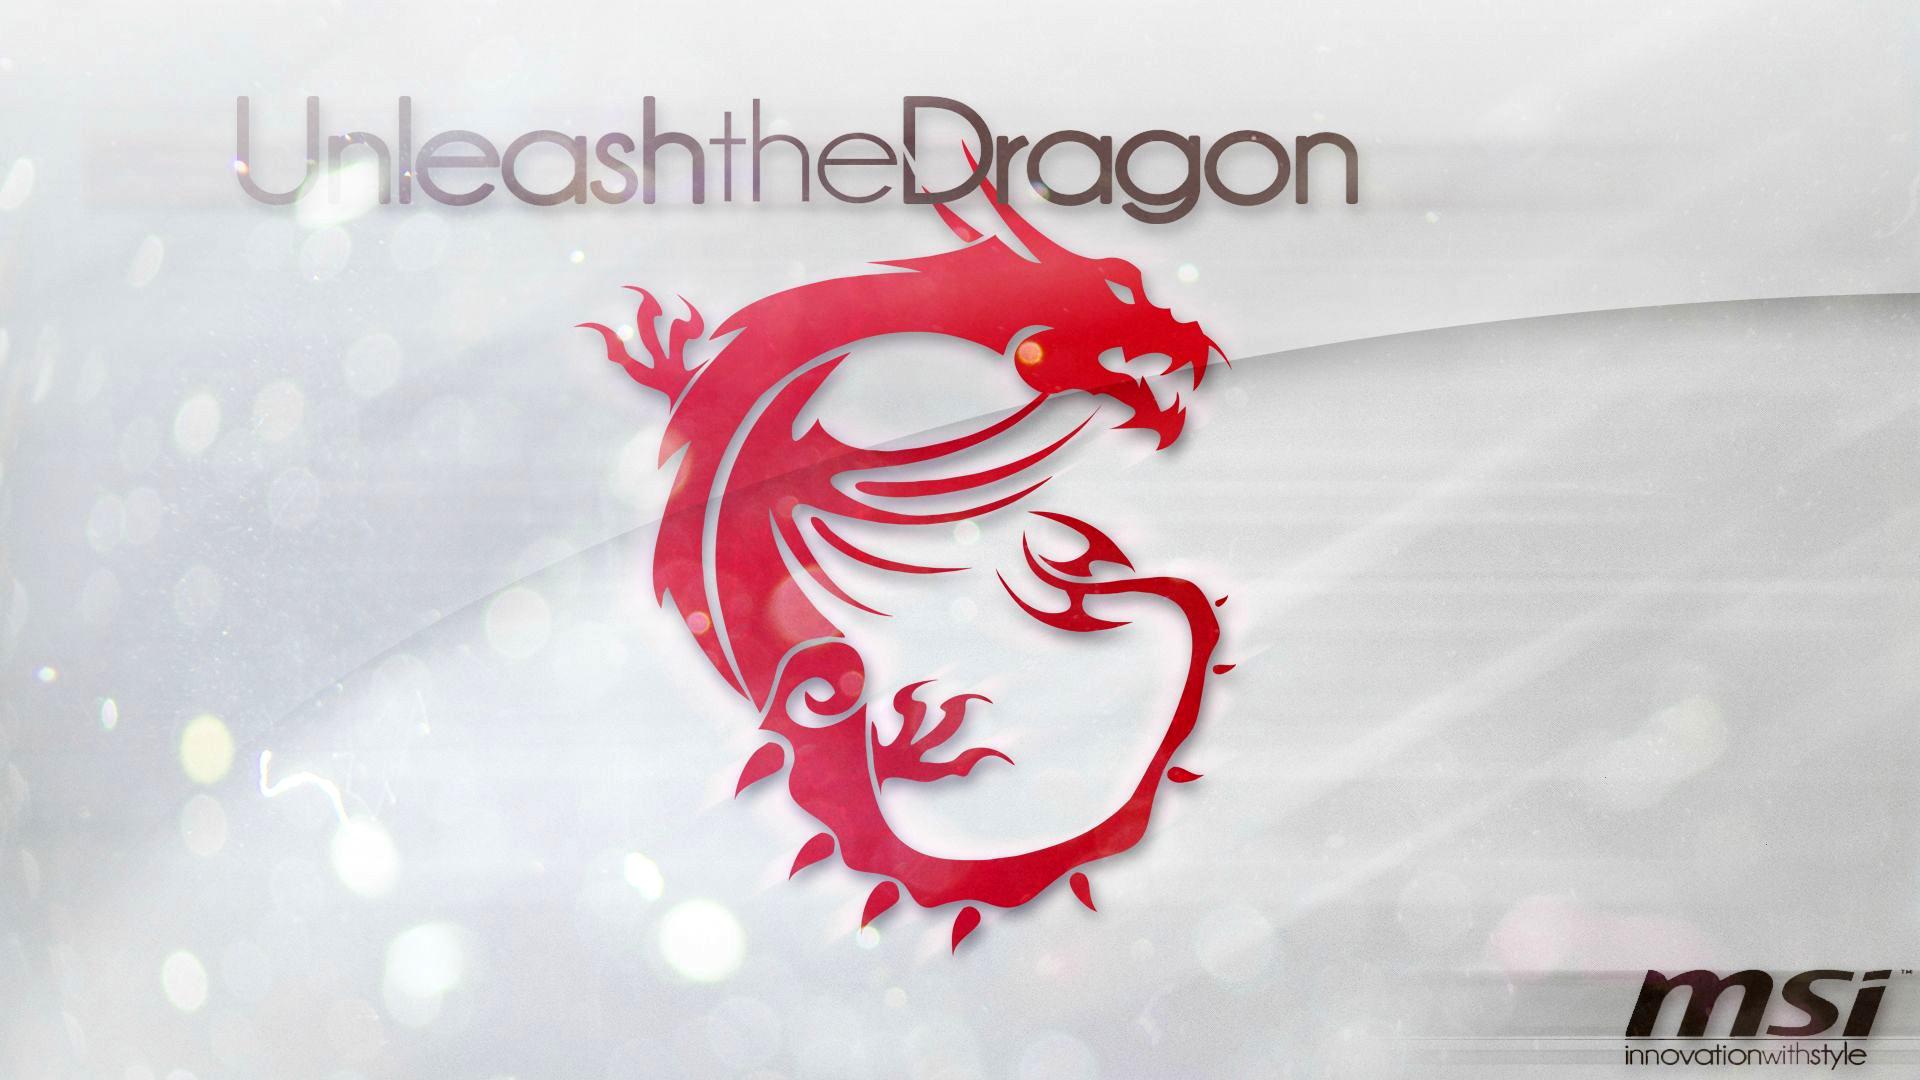 Msi 1366x768 hd wallpaper wallpapersafari msi red dragon logo hd 1920x1080 1080p wallpaper compatible for 1920x1080 voltagebd Images